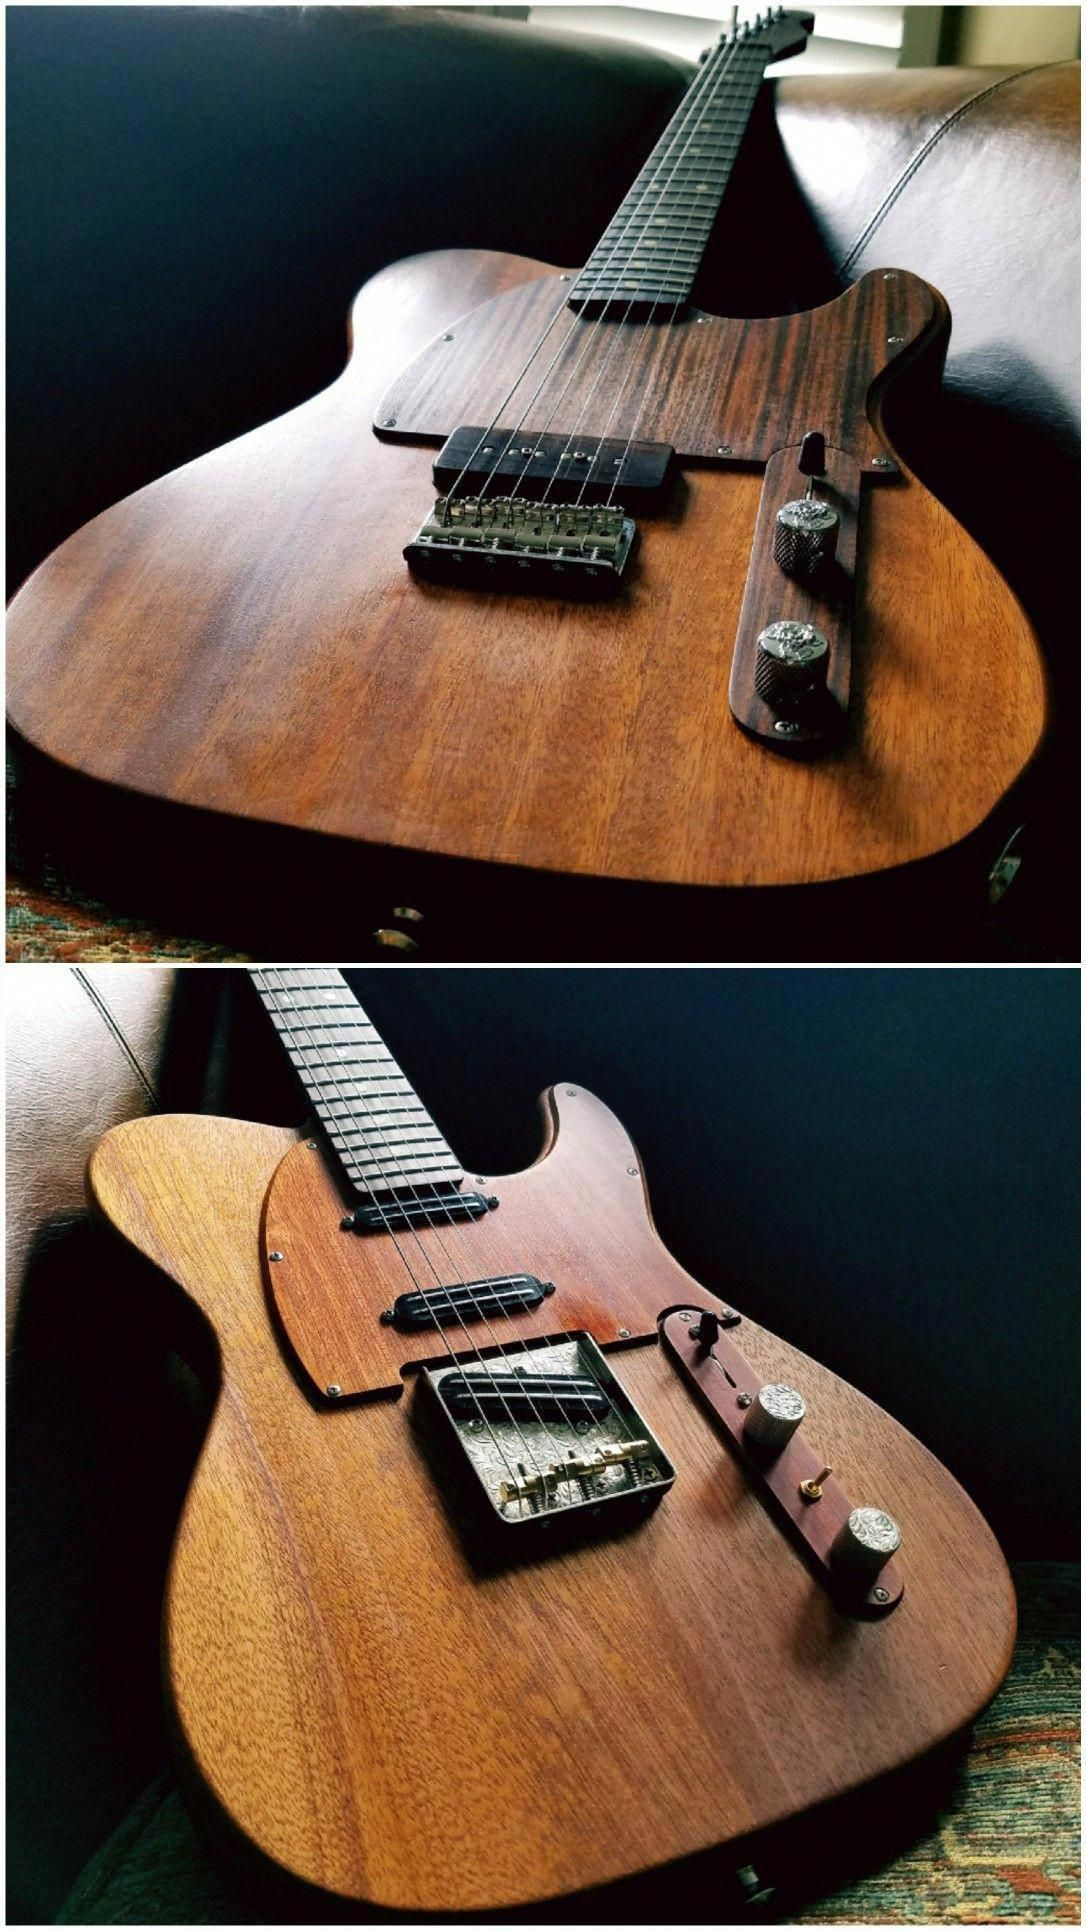 Bass Guitar Distortion Pedal Bass Guitar Repair Kit Guitardaily Guitarskills Bassguitar Guitar Telecaster Acoustic Guitar